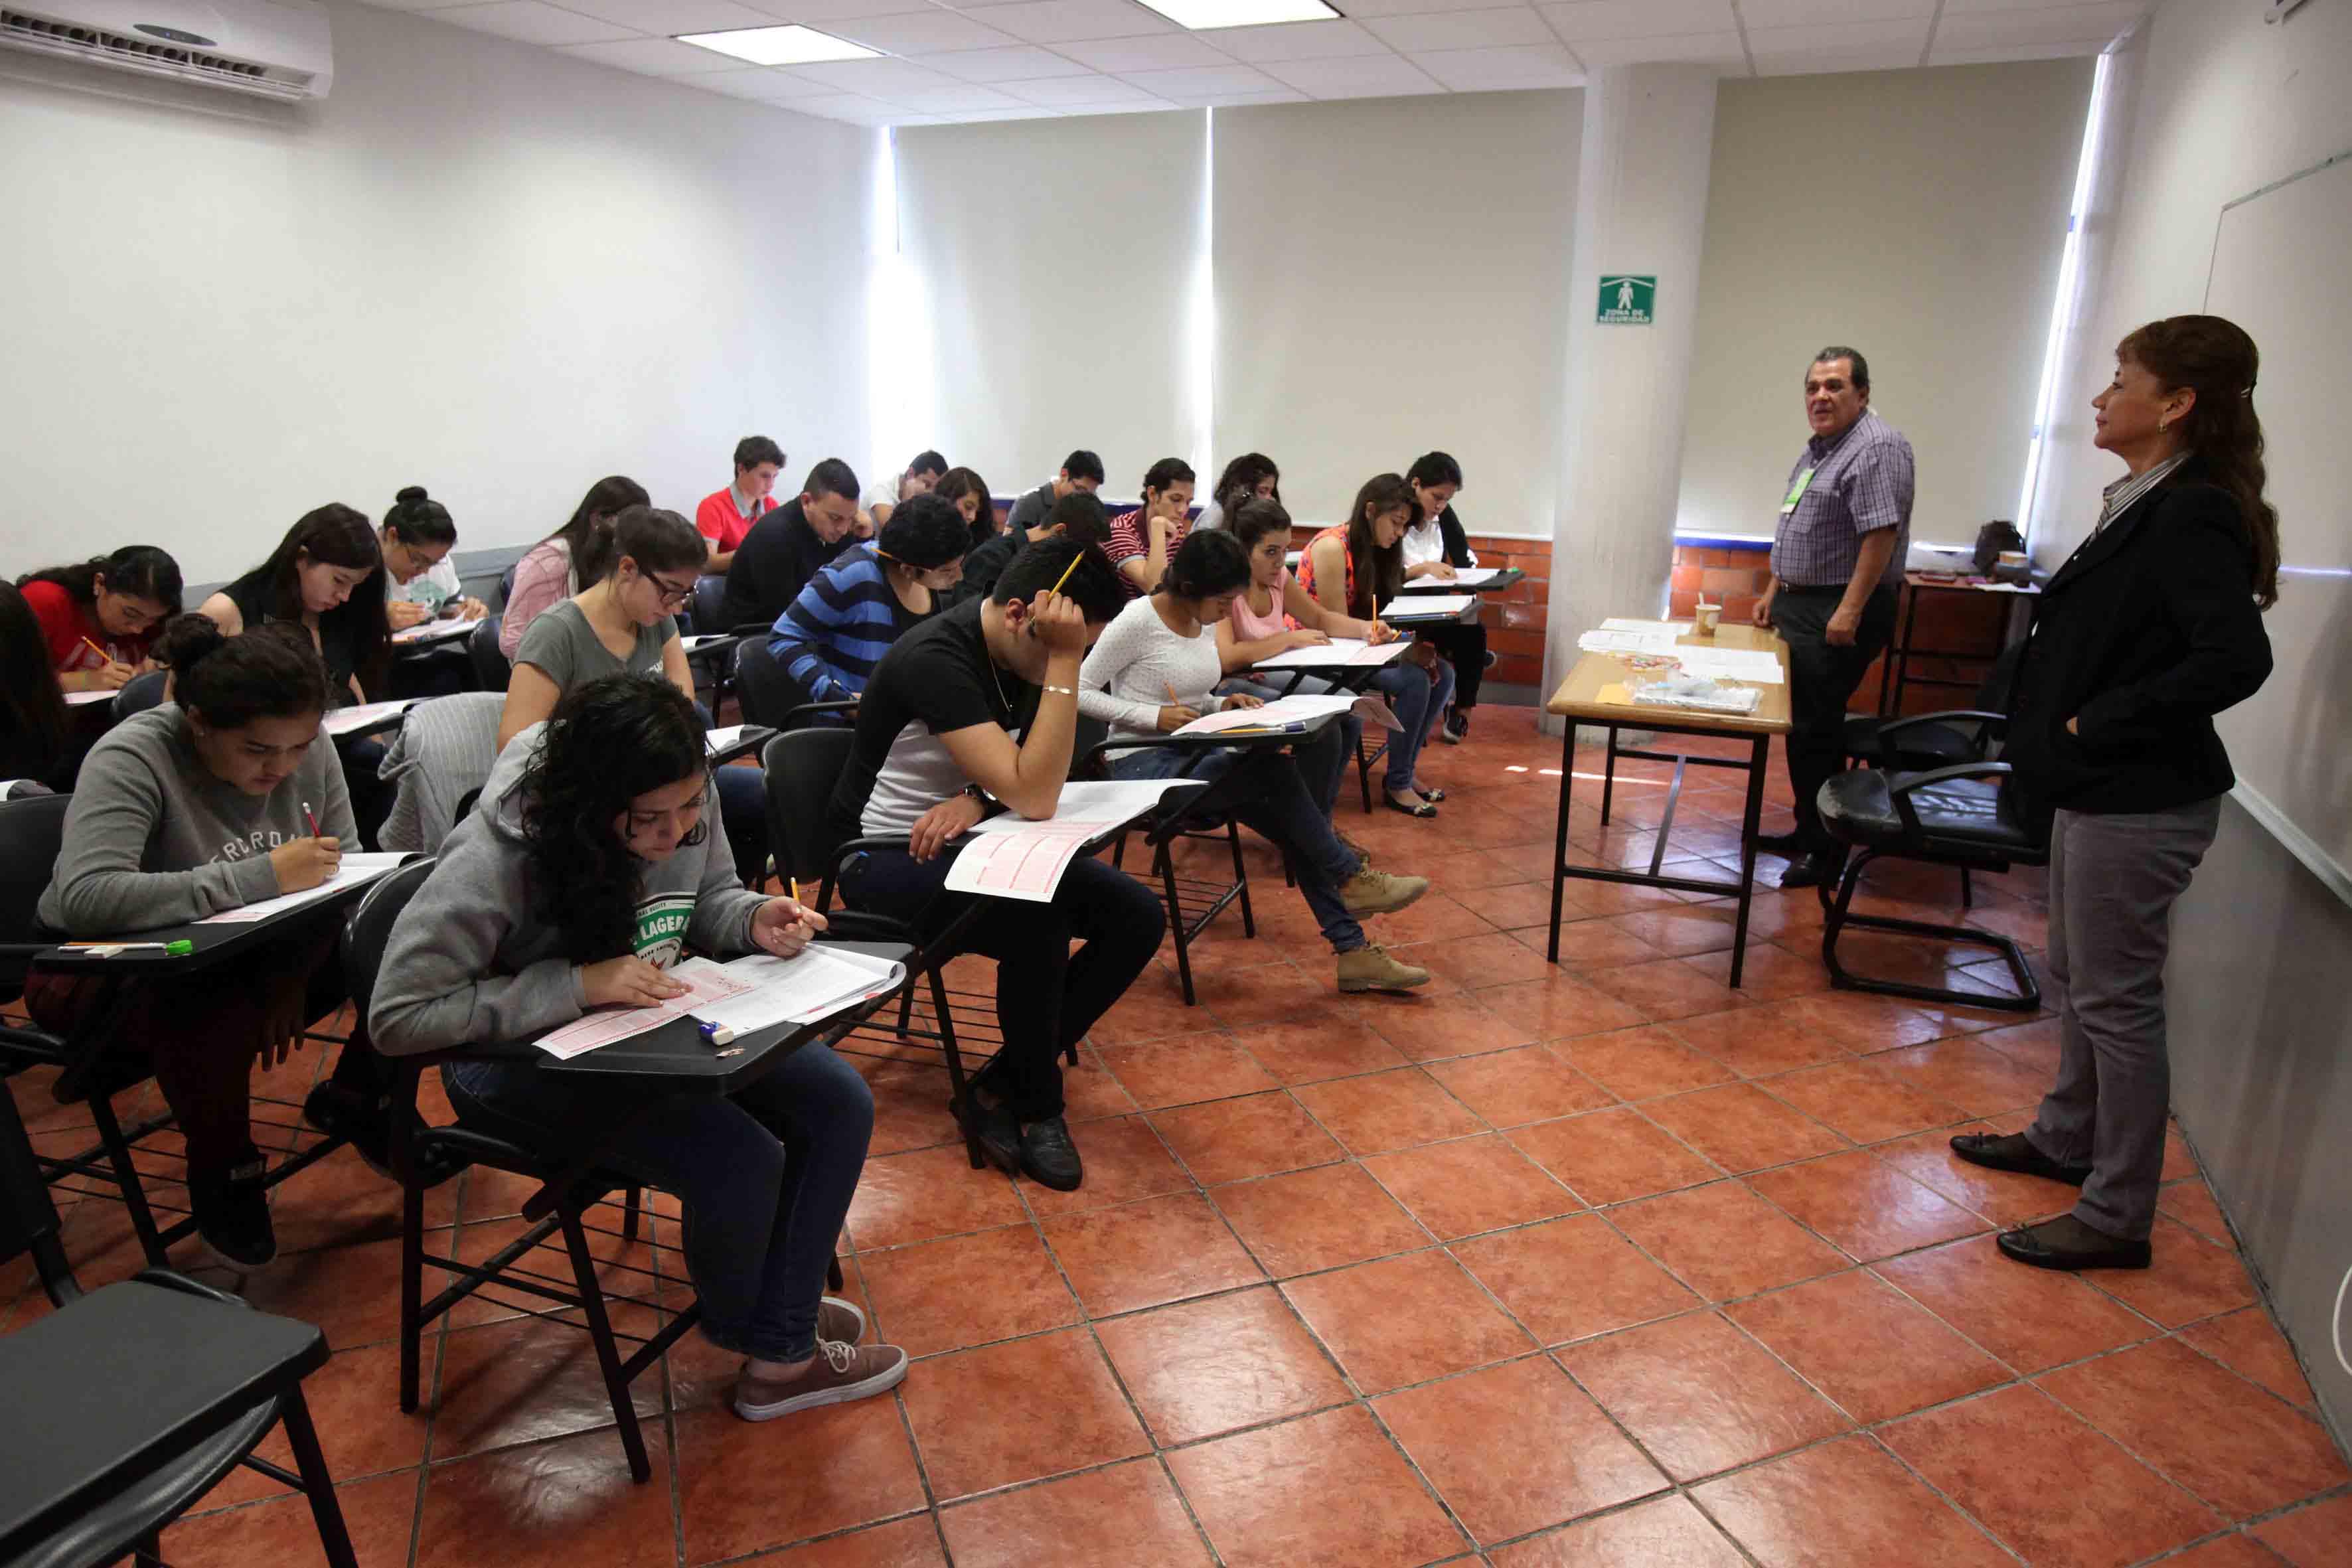 Aspirantes a licenciaturas presentando examen de admisión